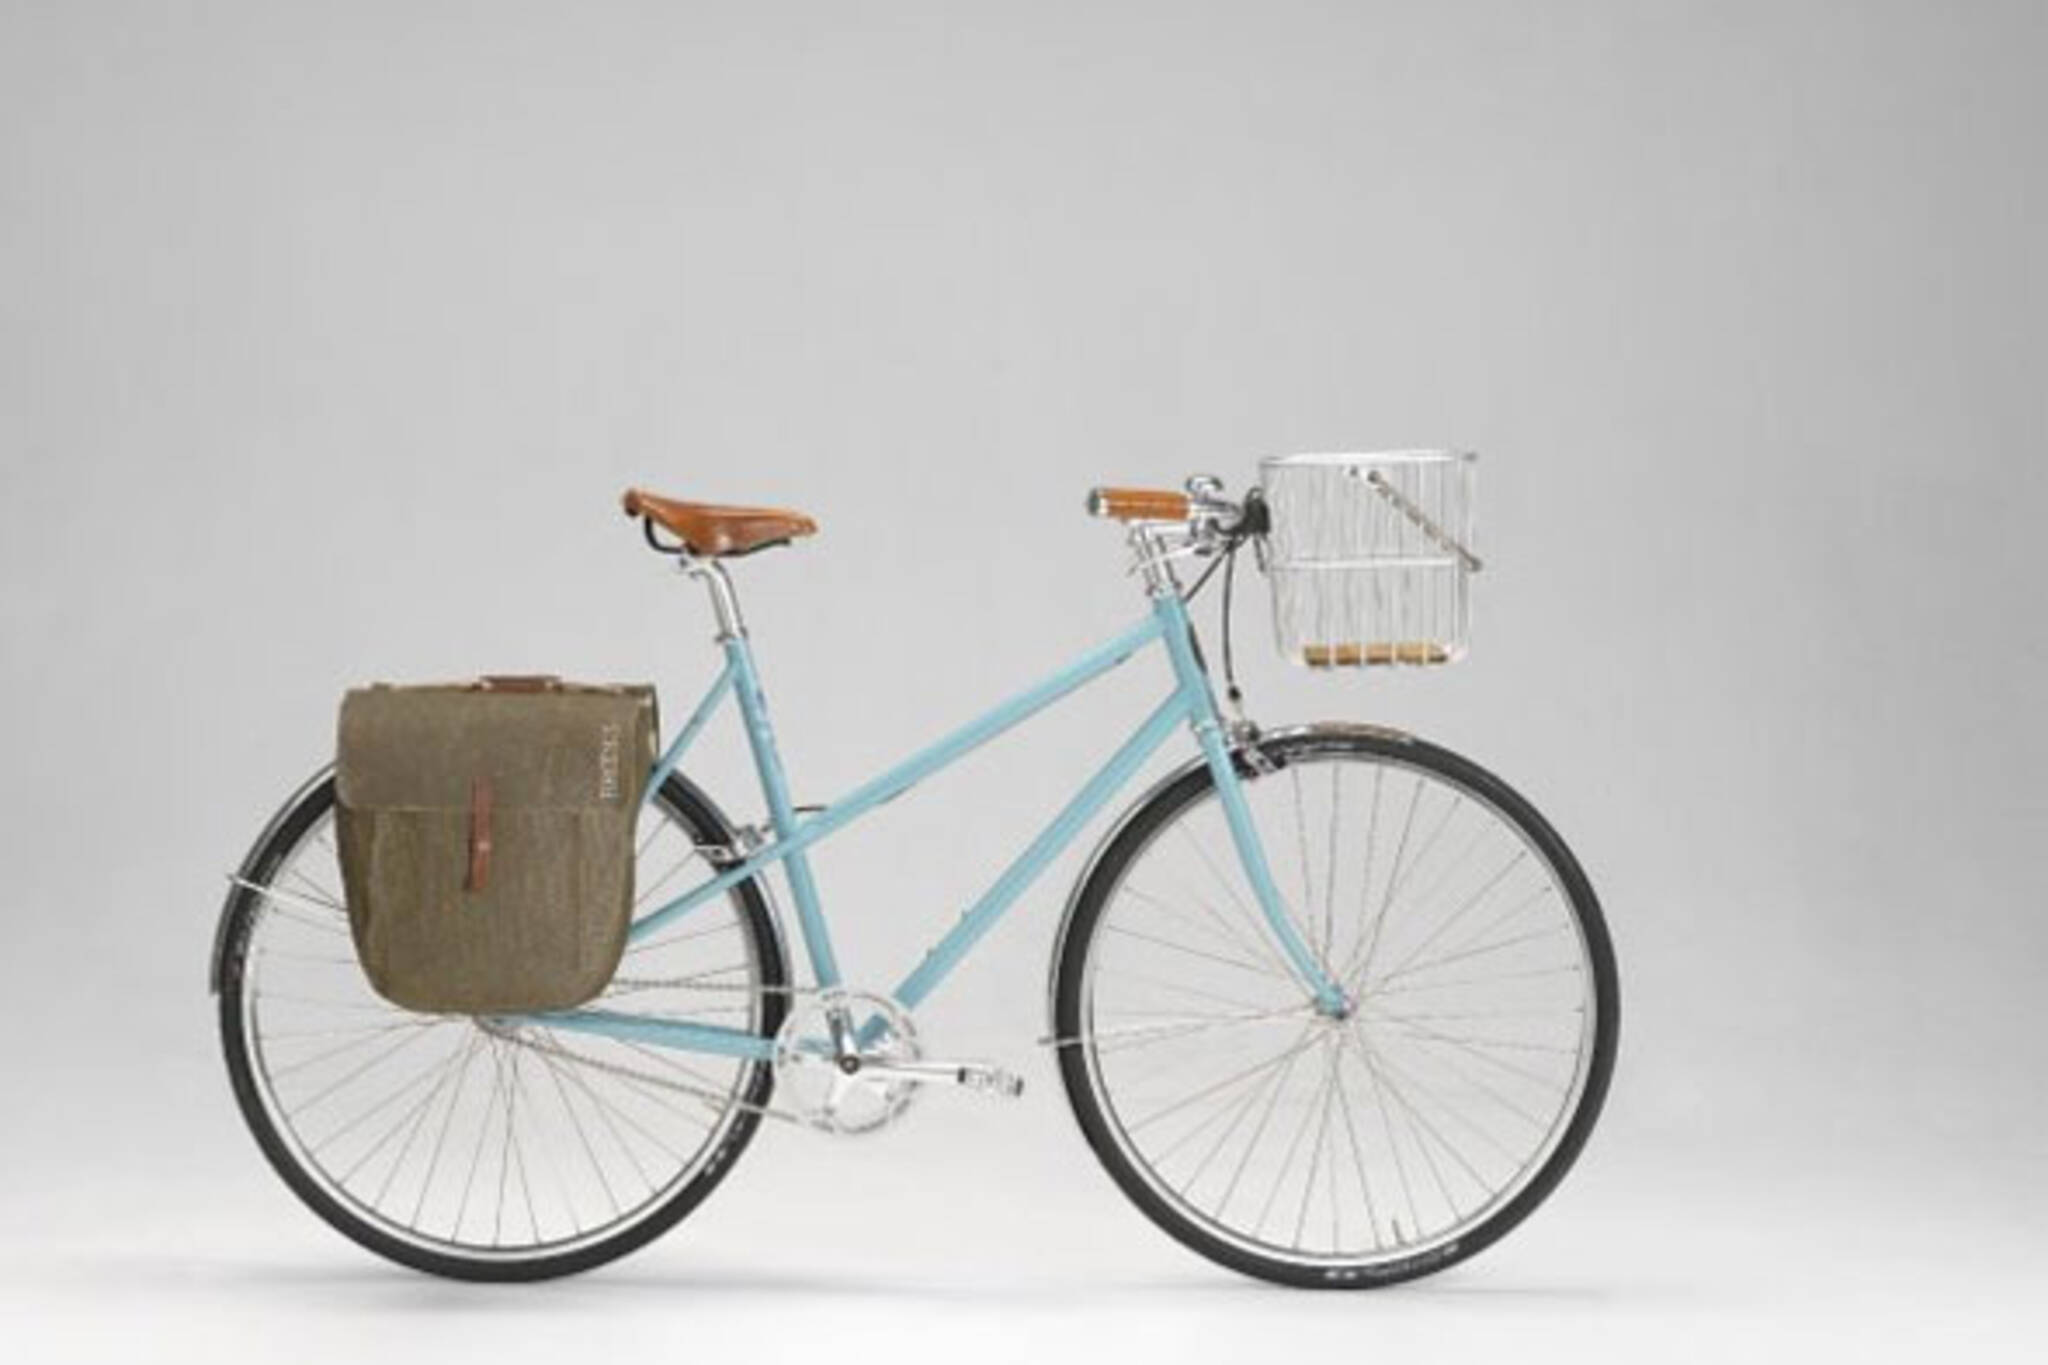 Brooks england dashing bicycle show